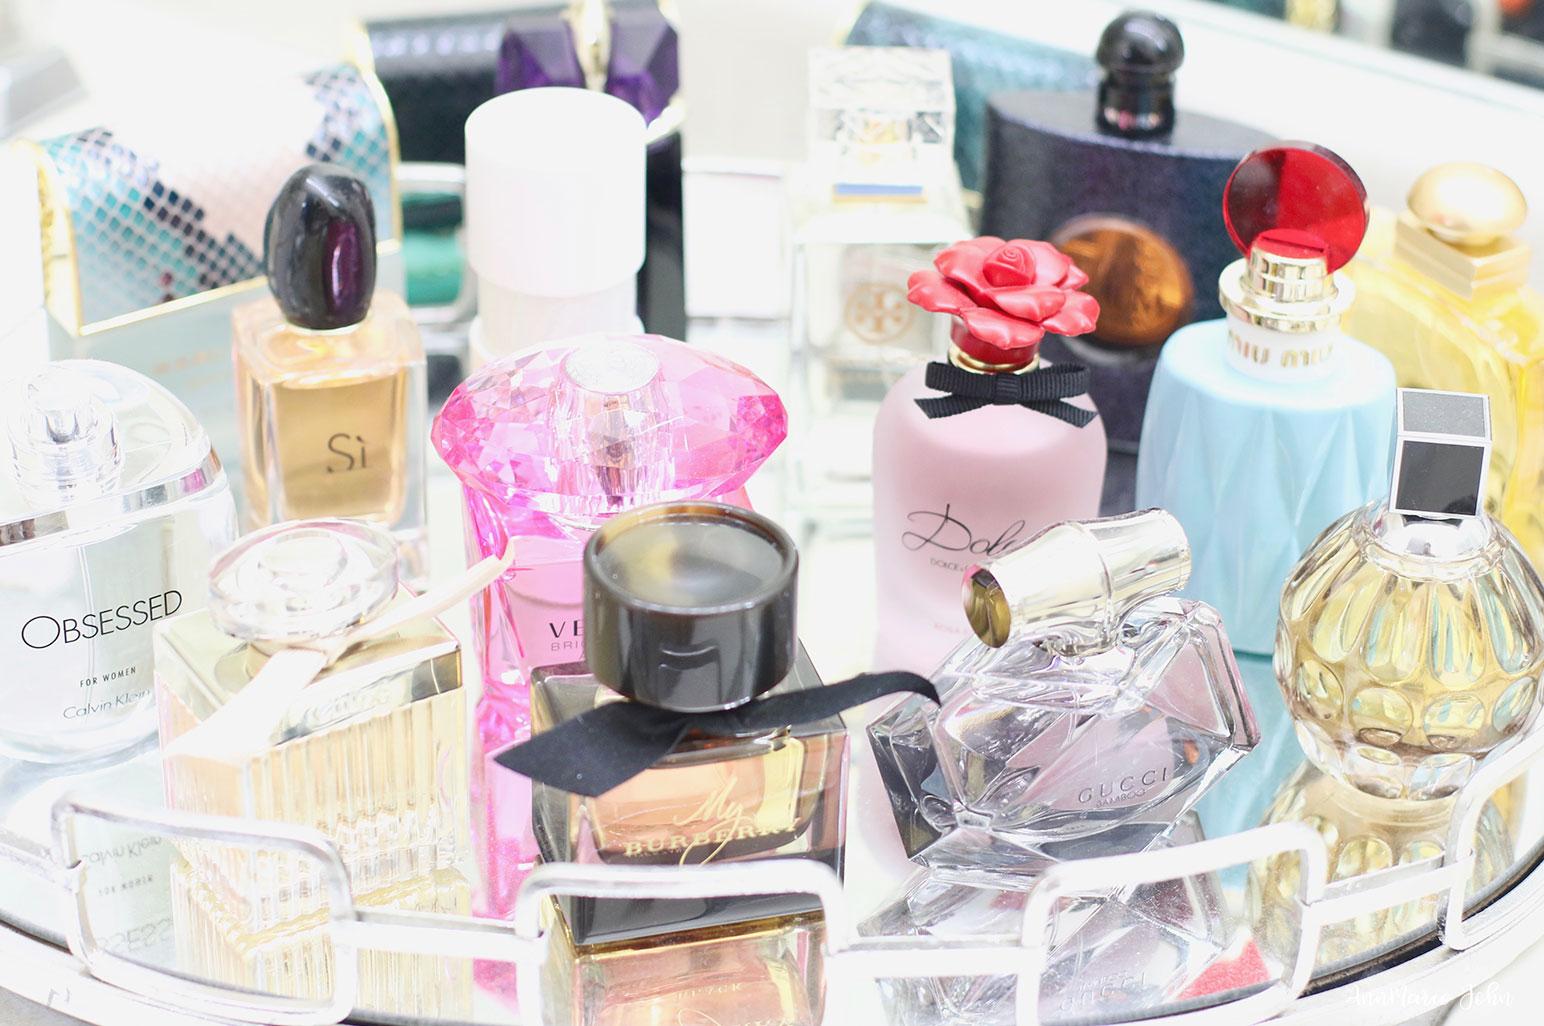 My Top 7 Designer Fragrances